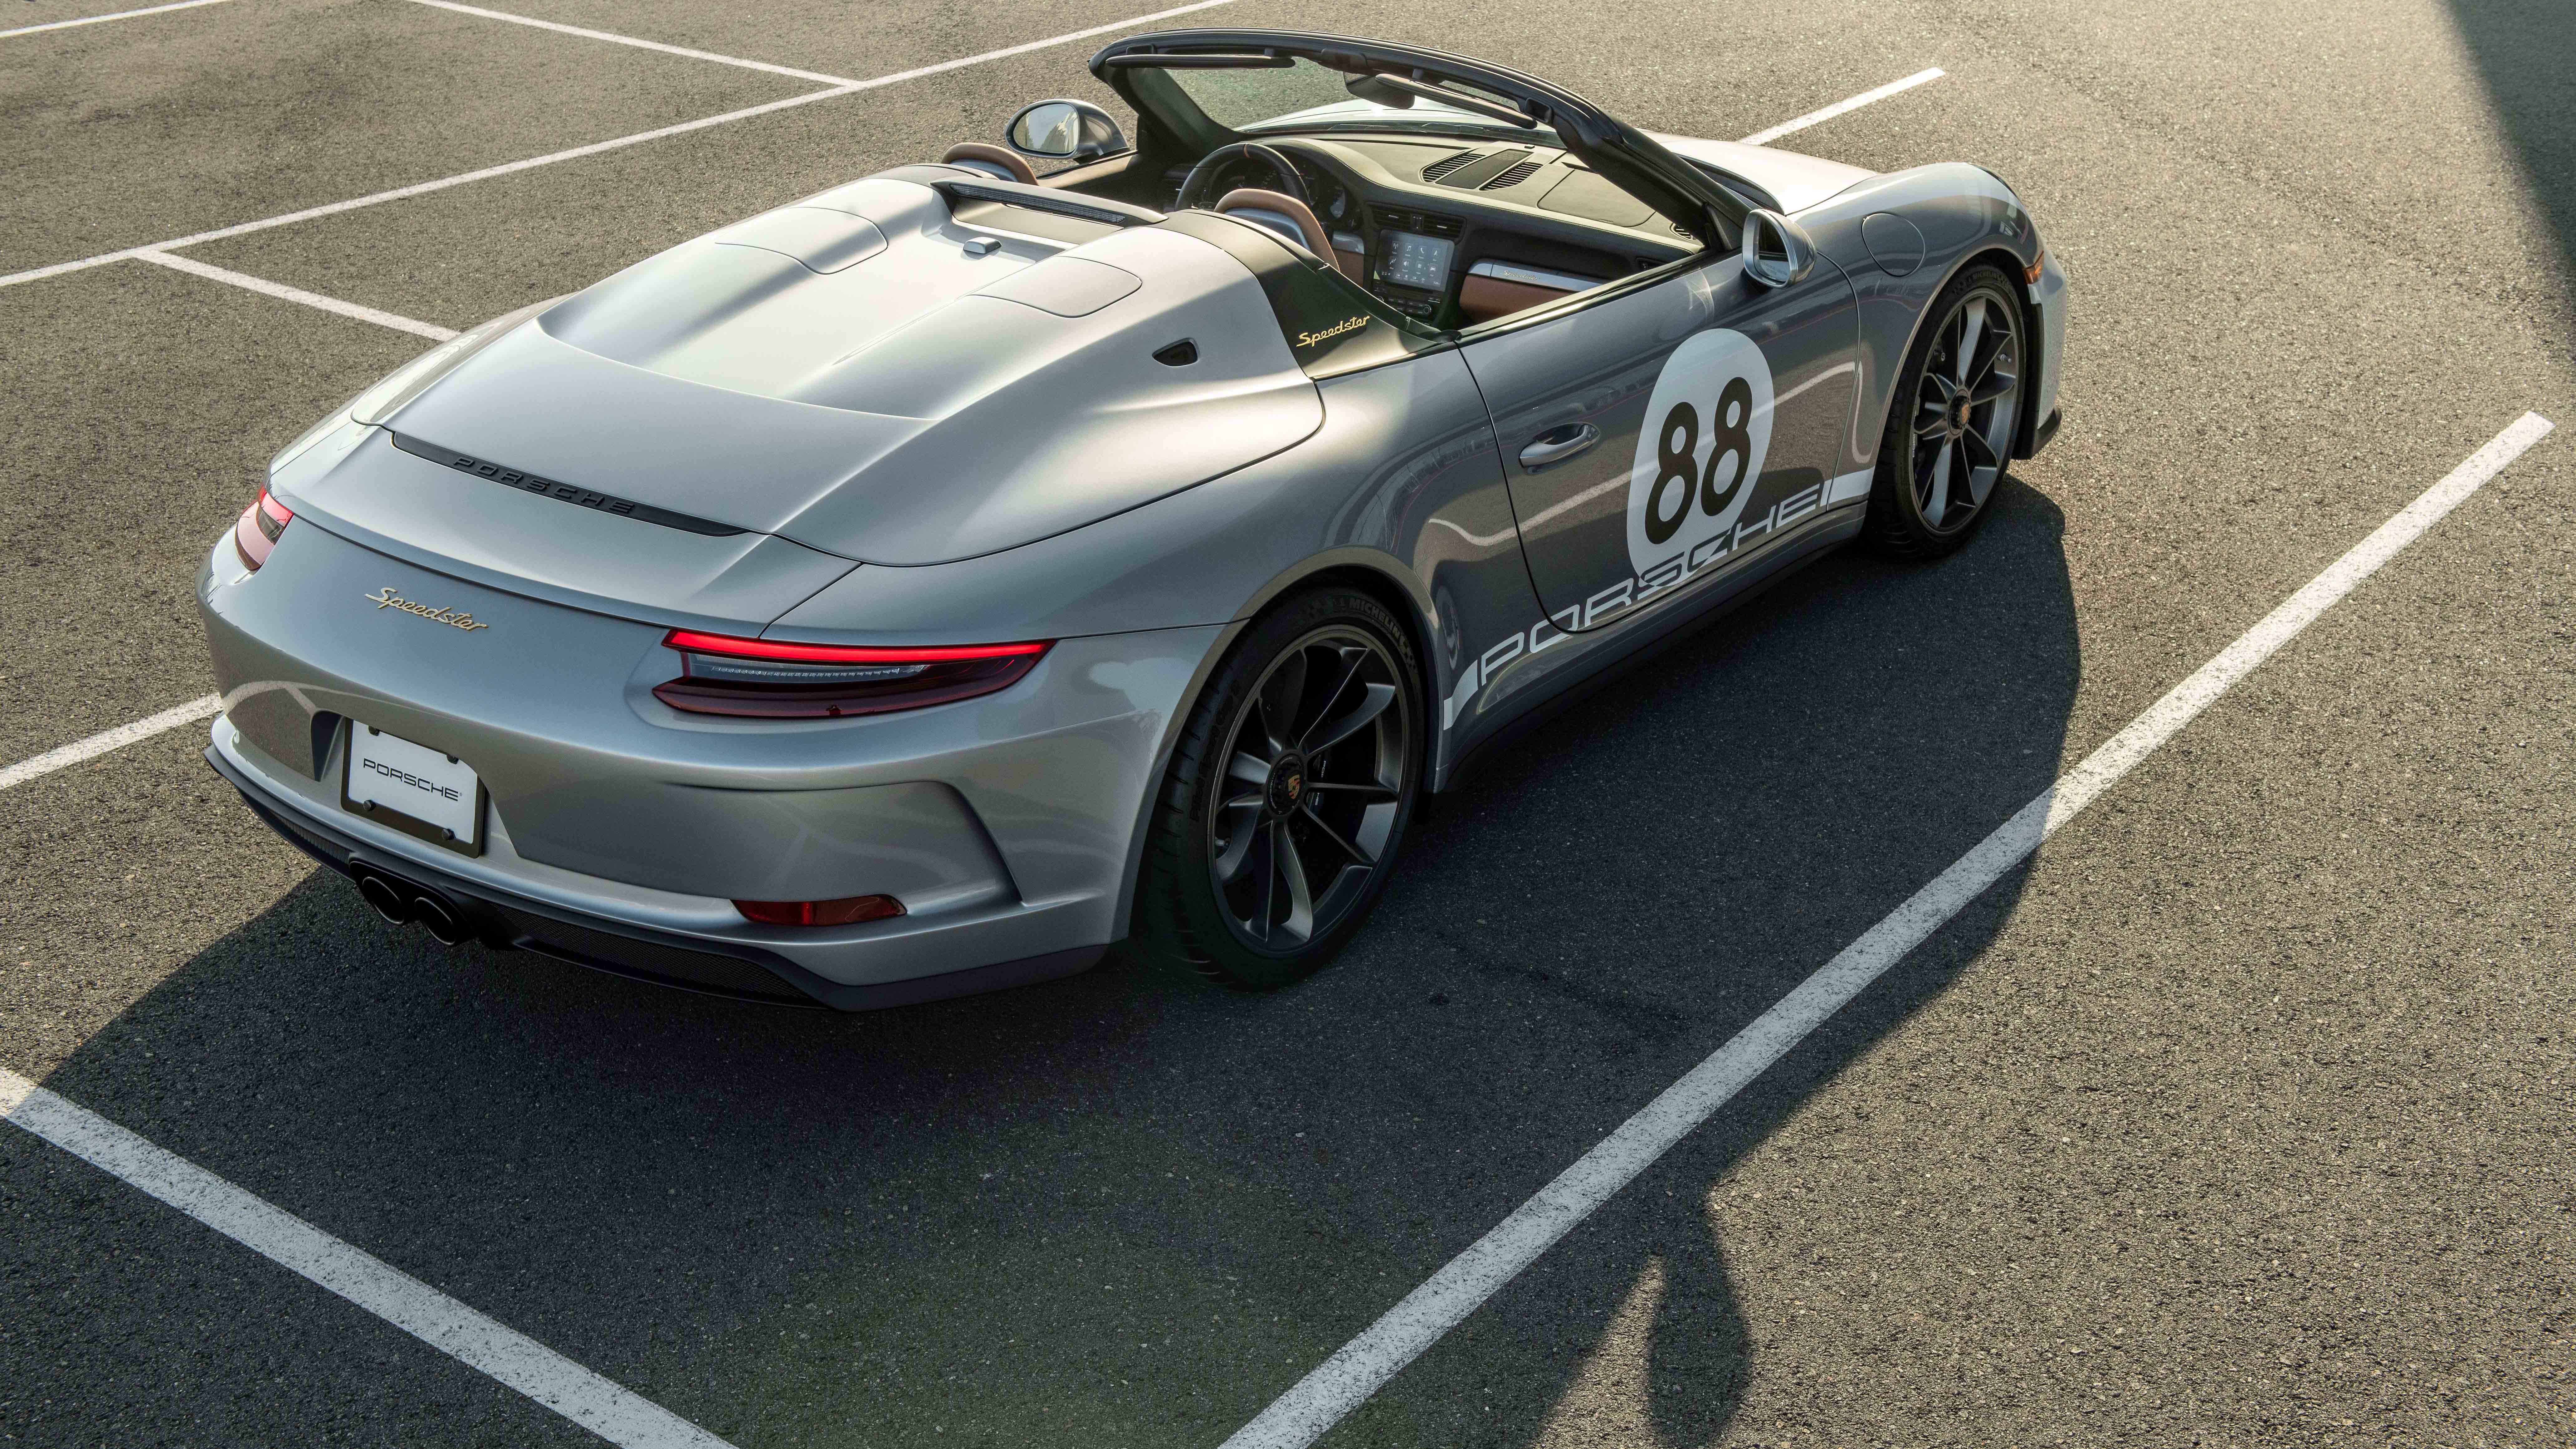 Porsche 911 Speedster that raised £1m for charity